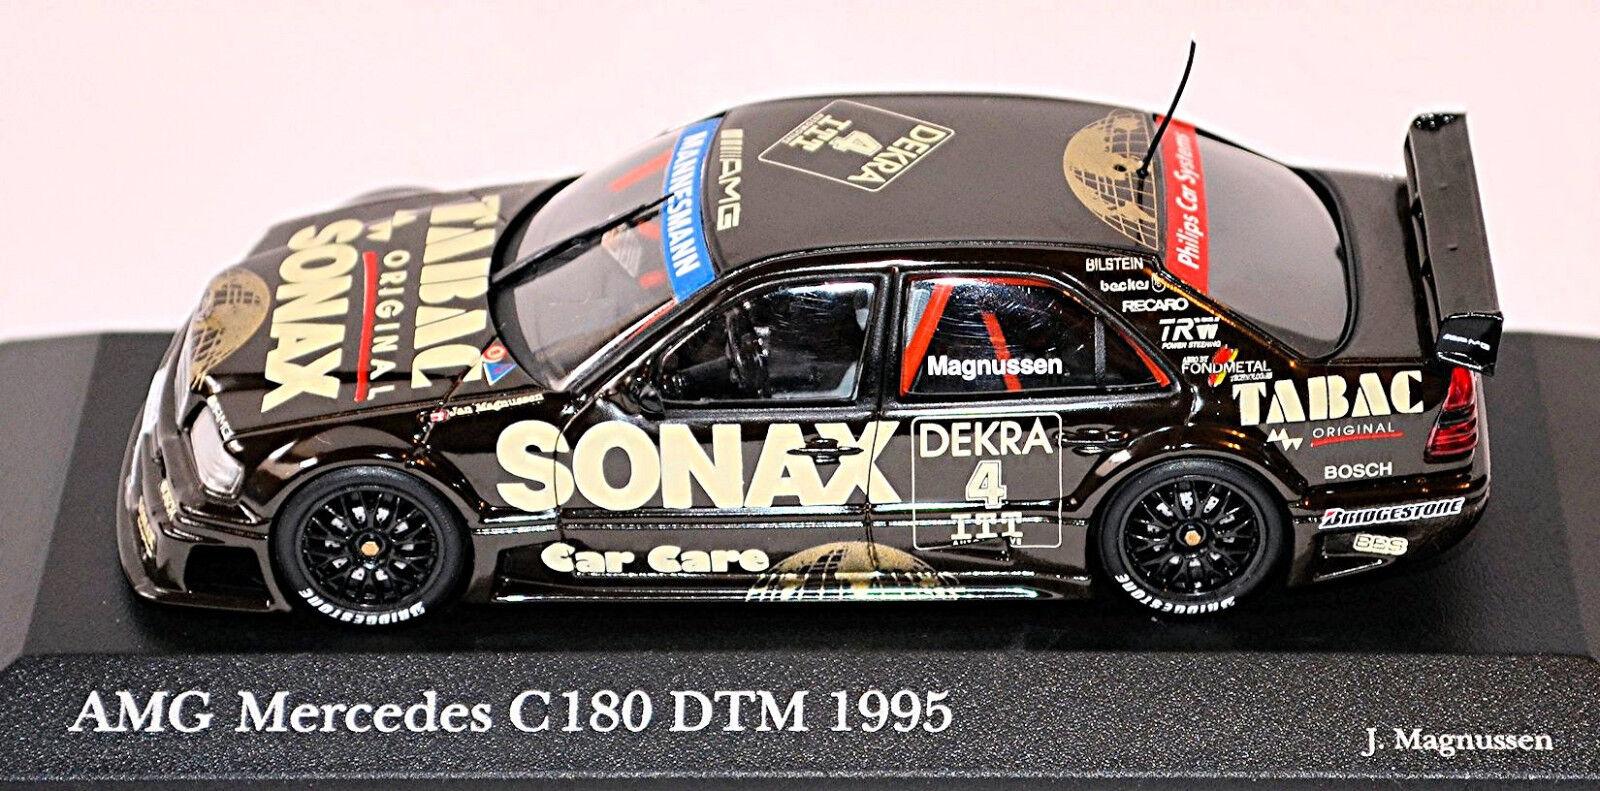 AMG Mercedes C 180 DTM 1995 1995 1995 Magnussen   4 SONAX Tabac Ups 1 43 Minichamps 74944c